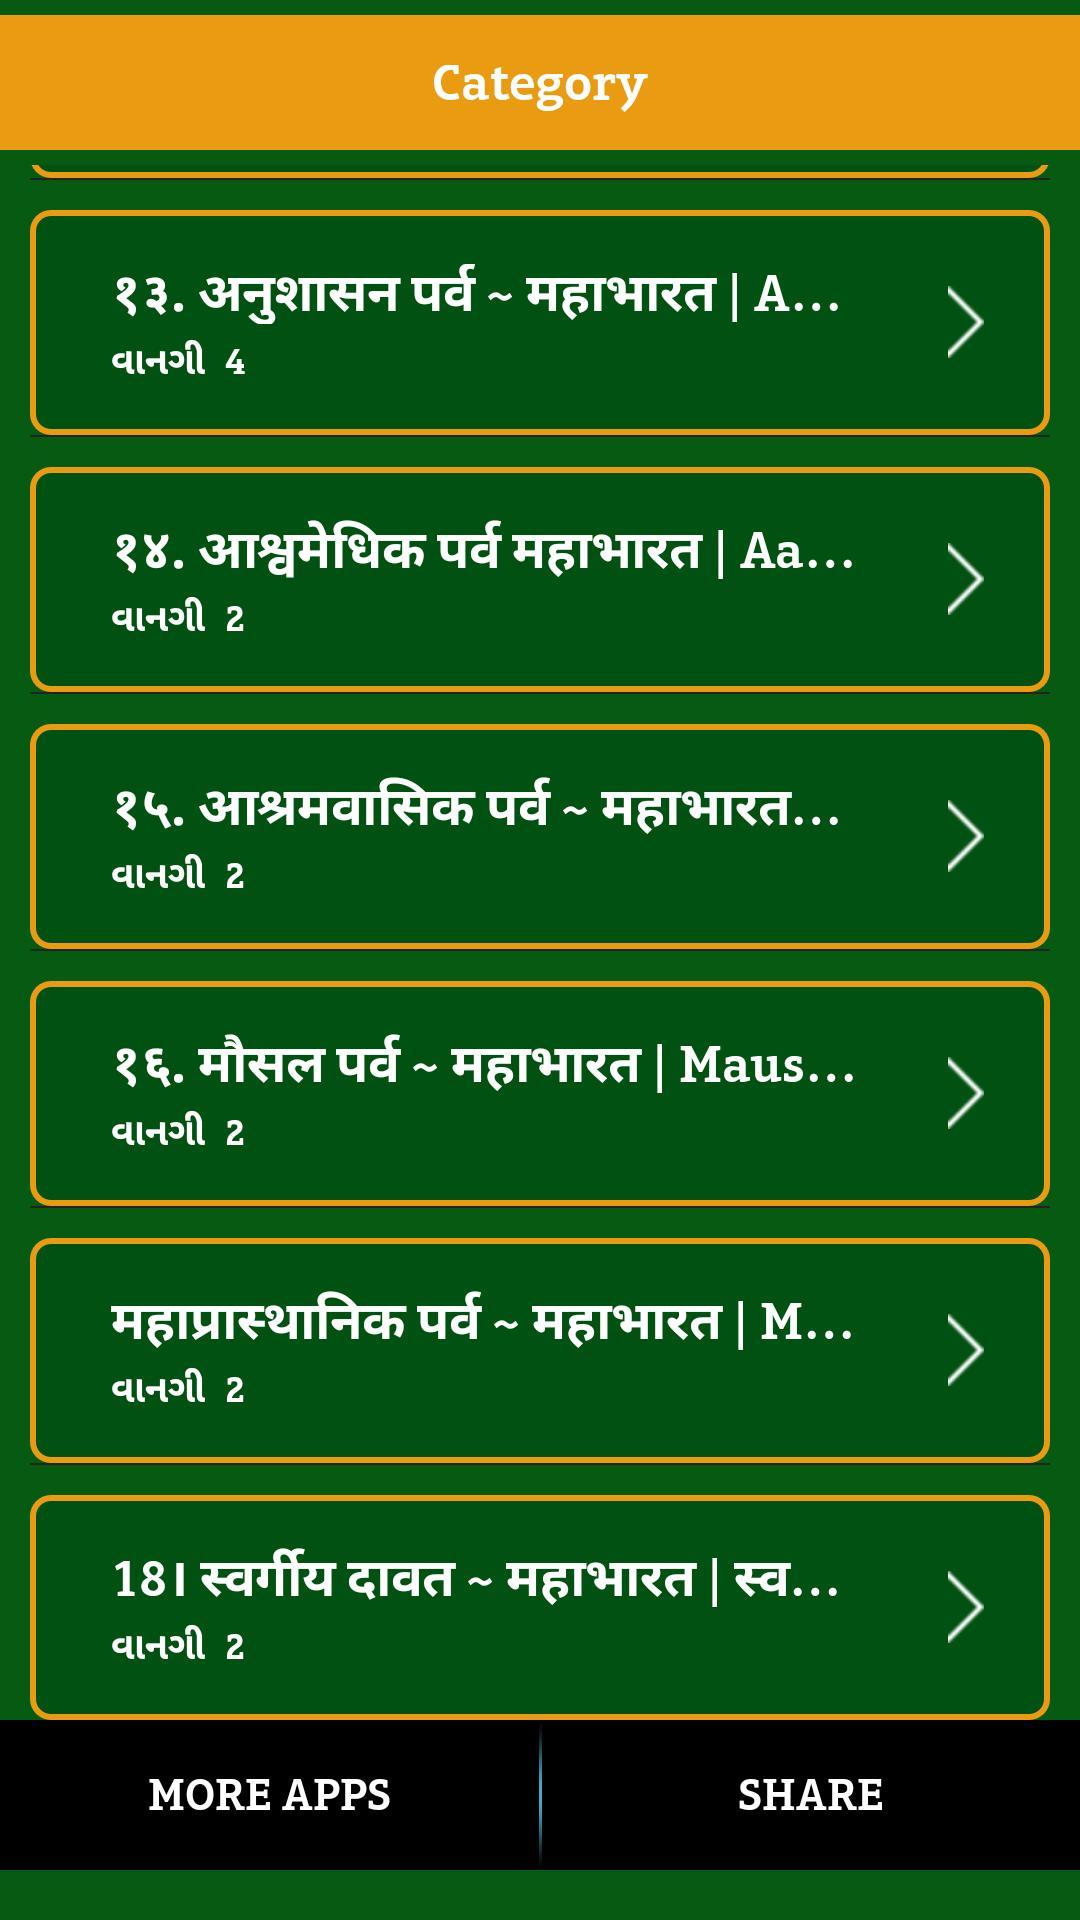 Mahabharat 181